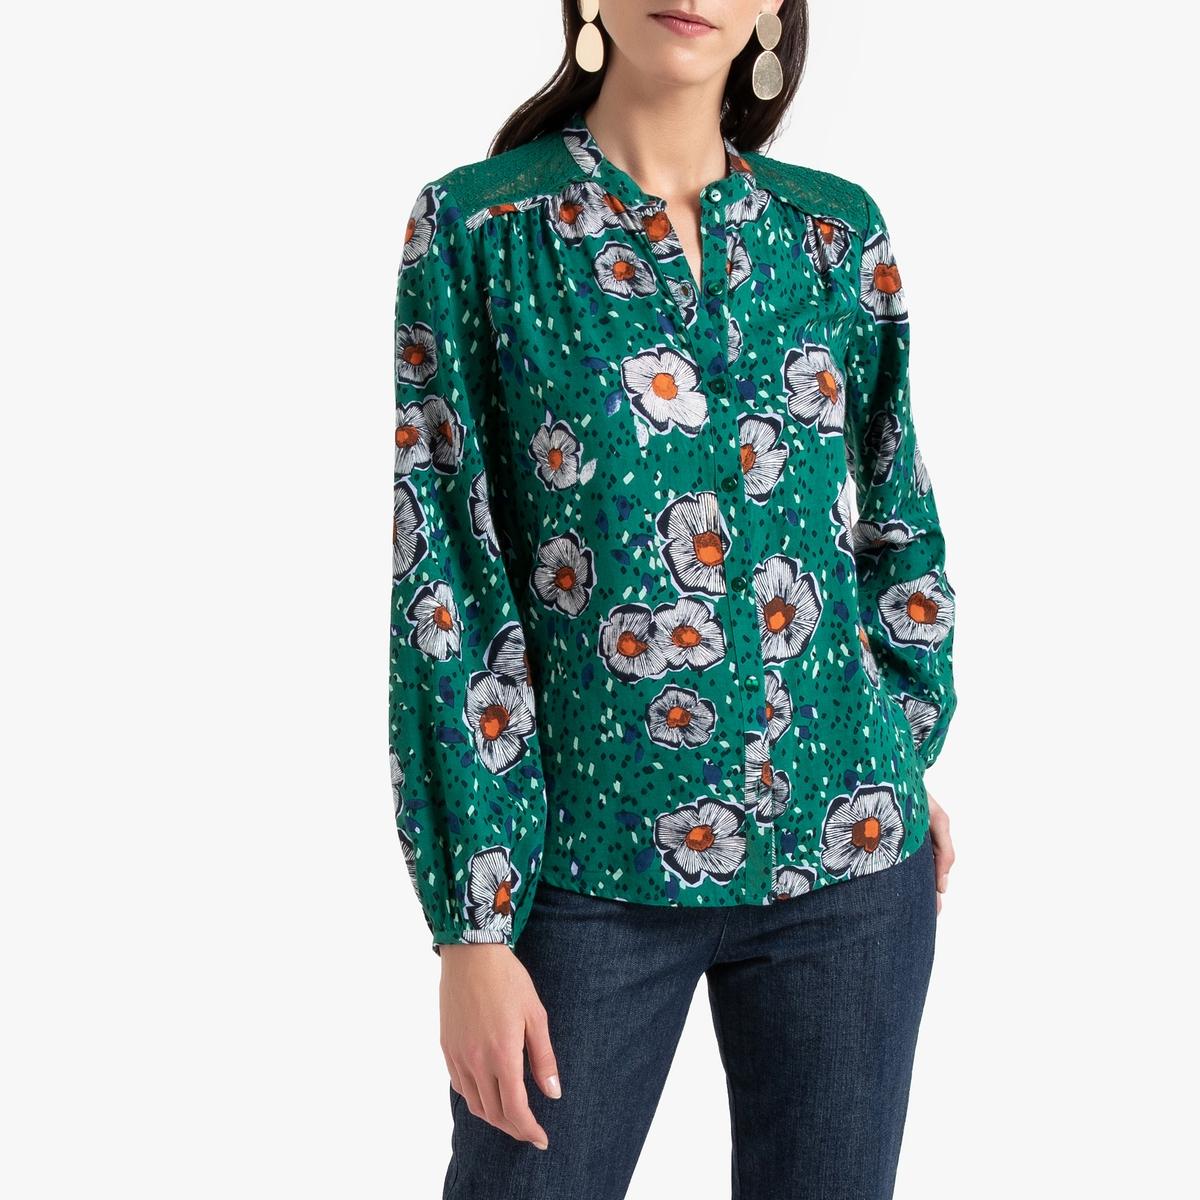 Camisa com estampado floral, decote tunisino